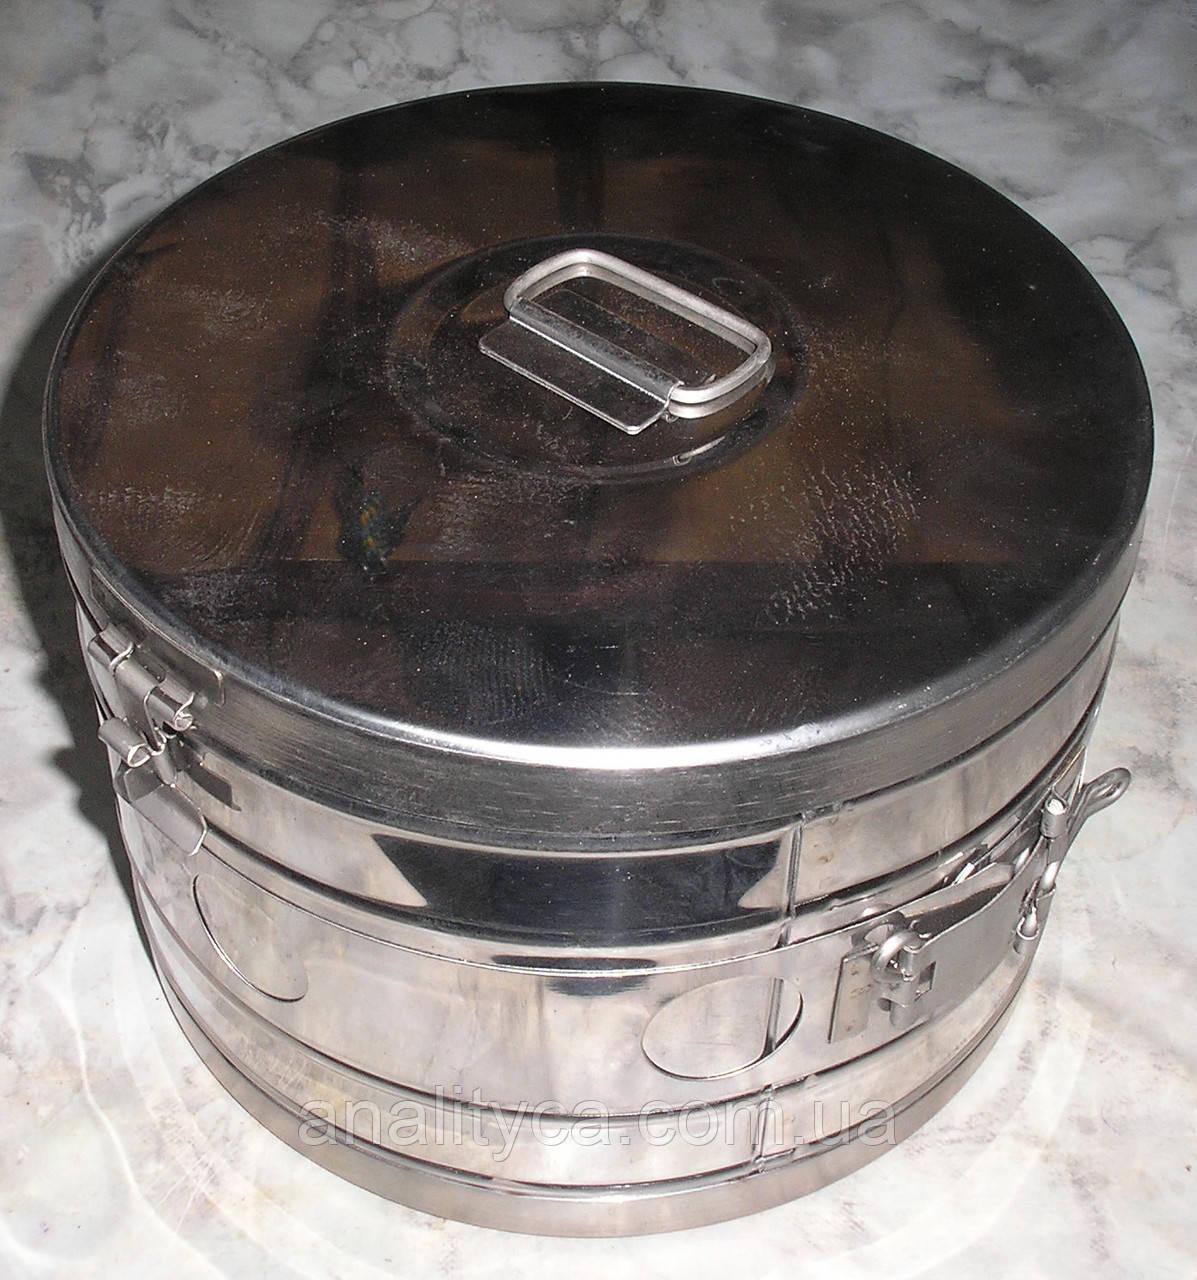 Коробка стерилізаційна КСК-6